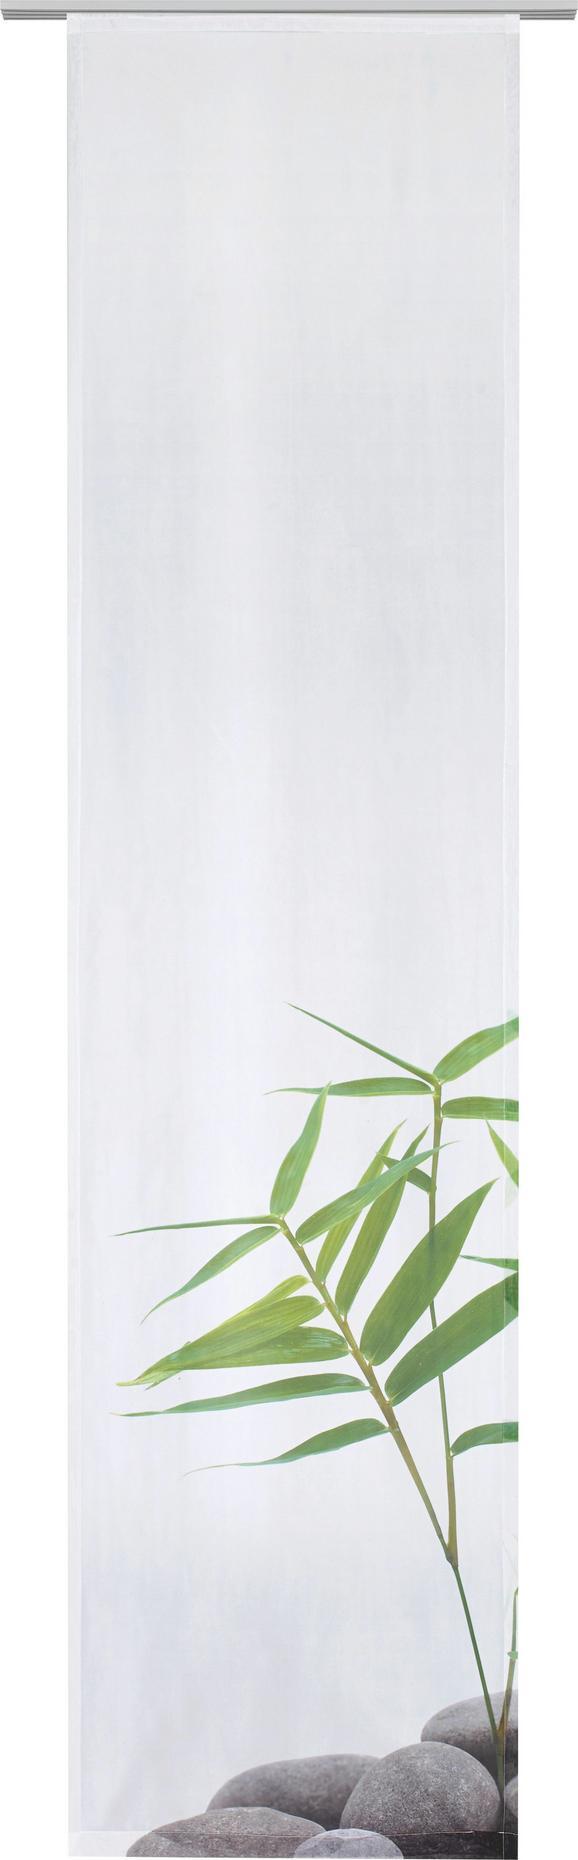 Panelna Zavesa Spa - siva/bela, Trendi, tekstil (60/245cm) - Mömax modern living